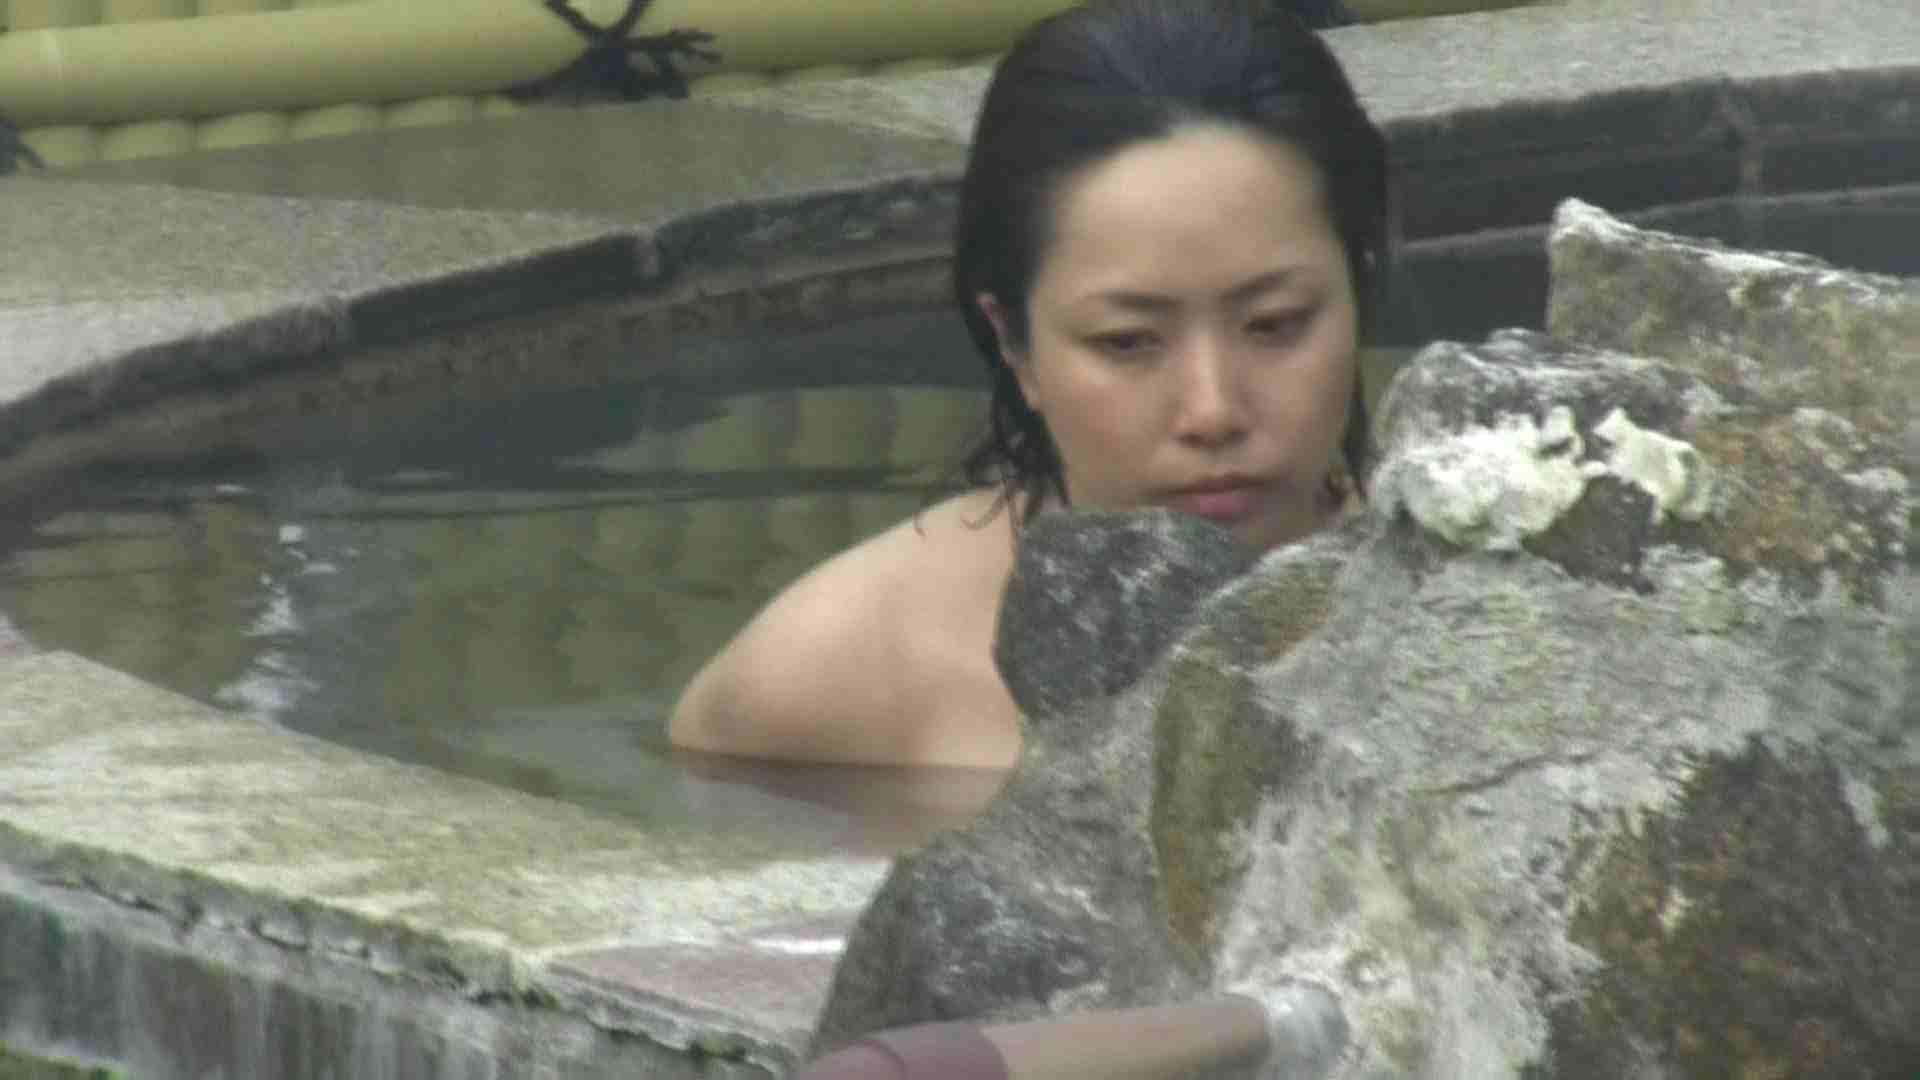 Aquaな露天風呂Vol.604 露天 オマンコ無修正動画無料 111枚 50